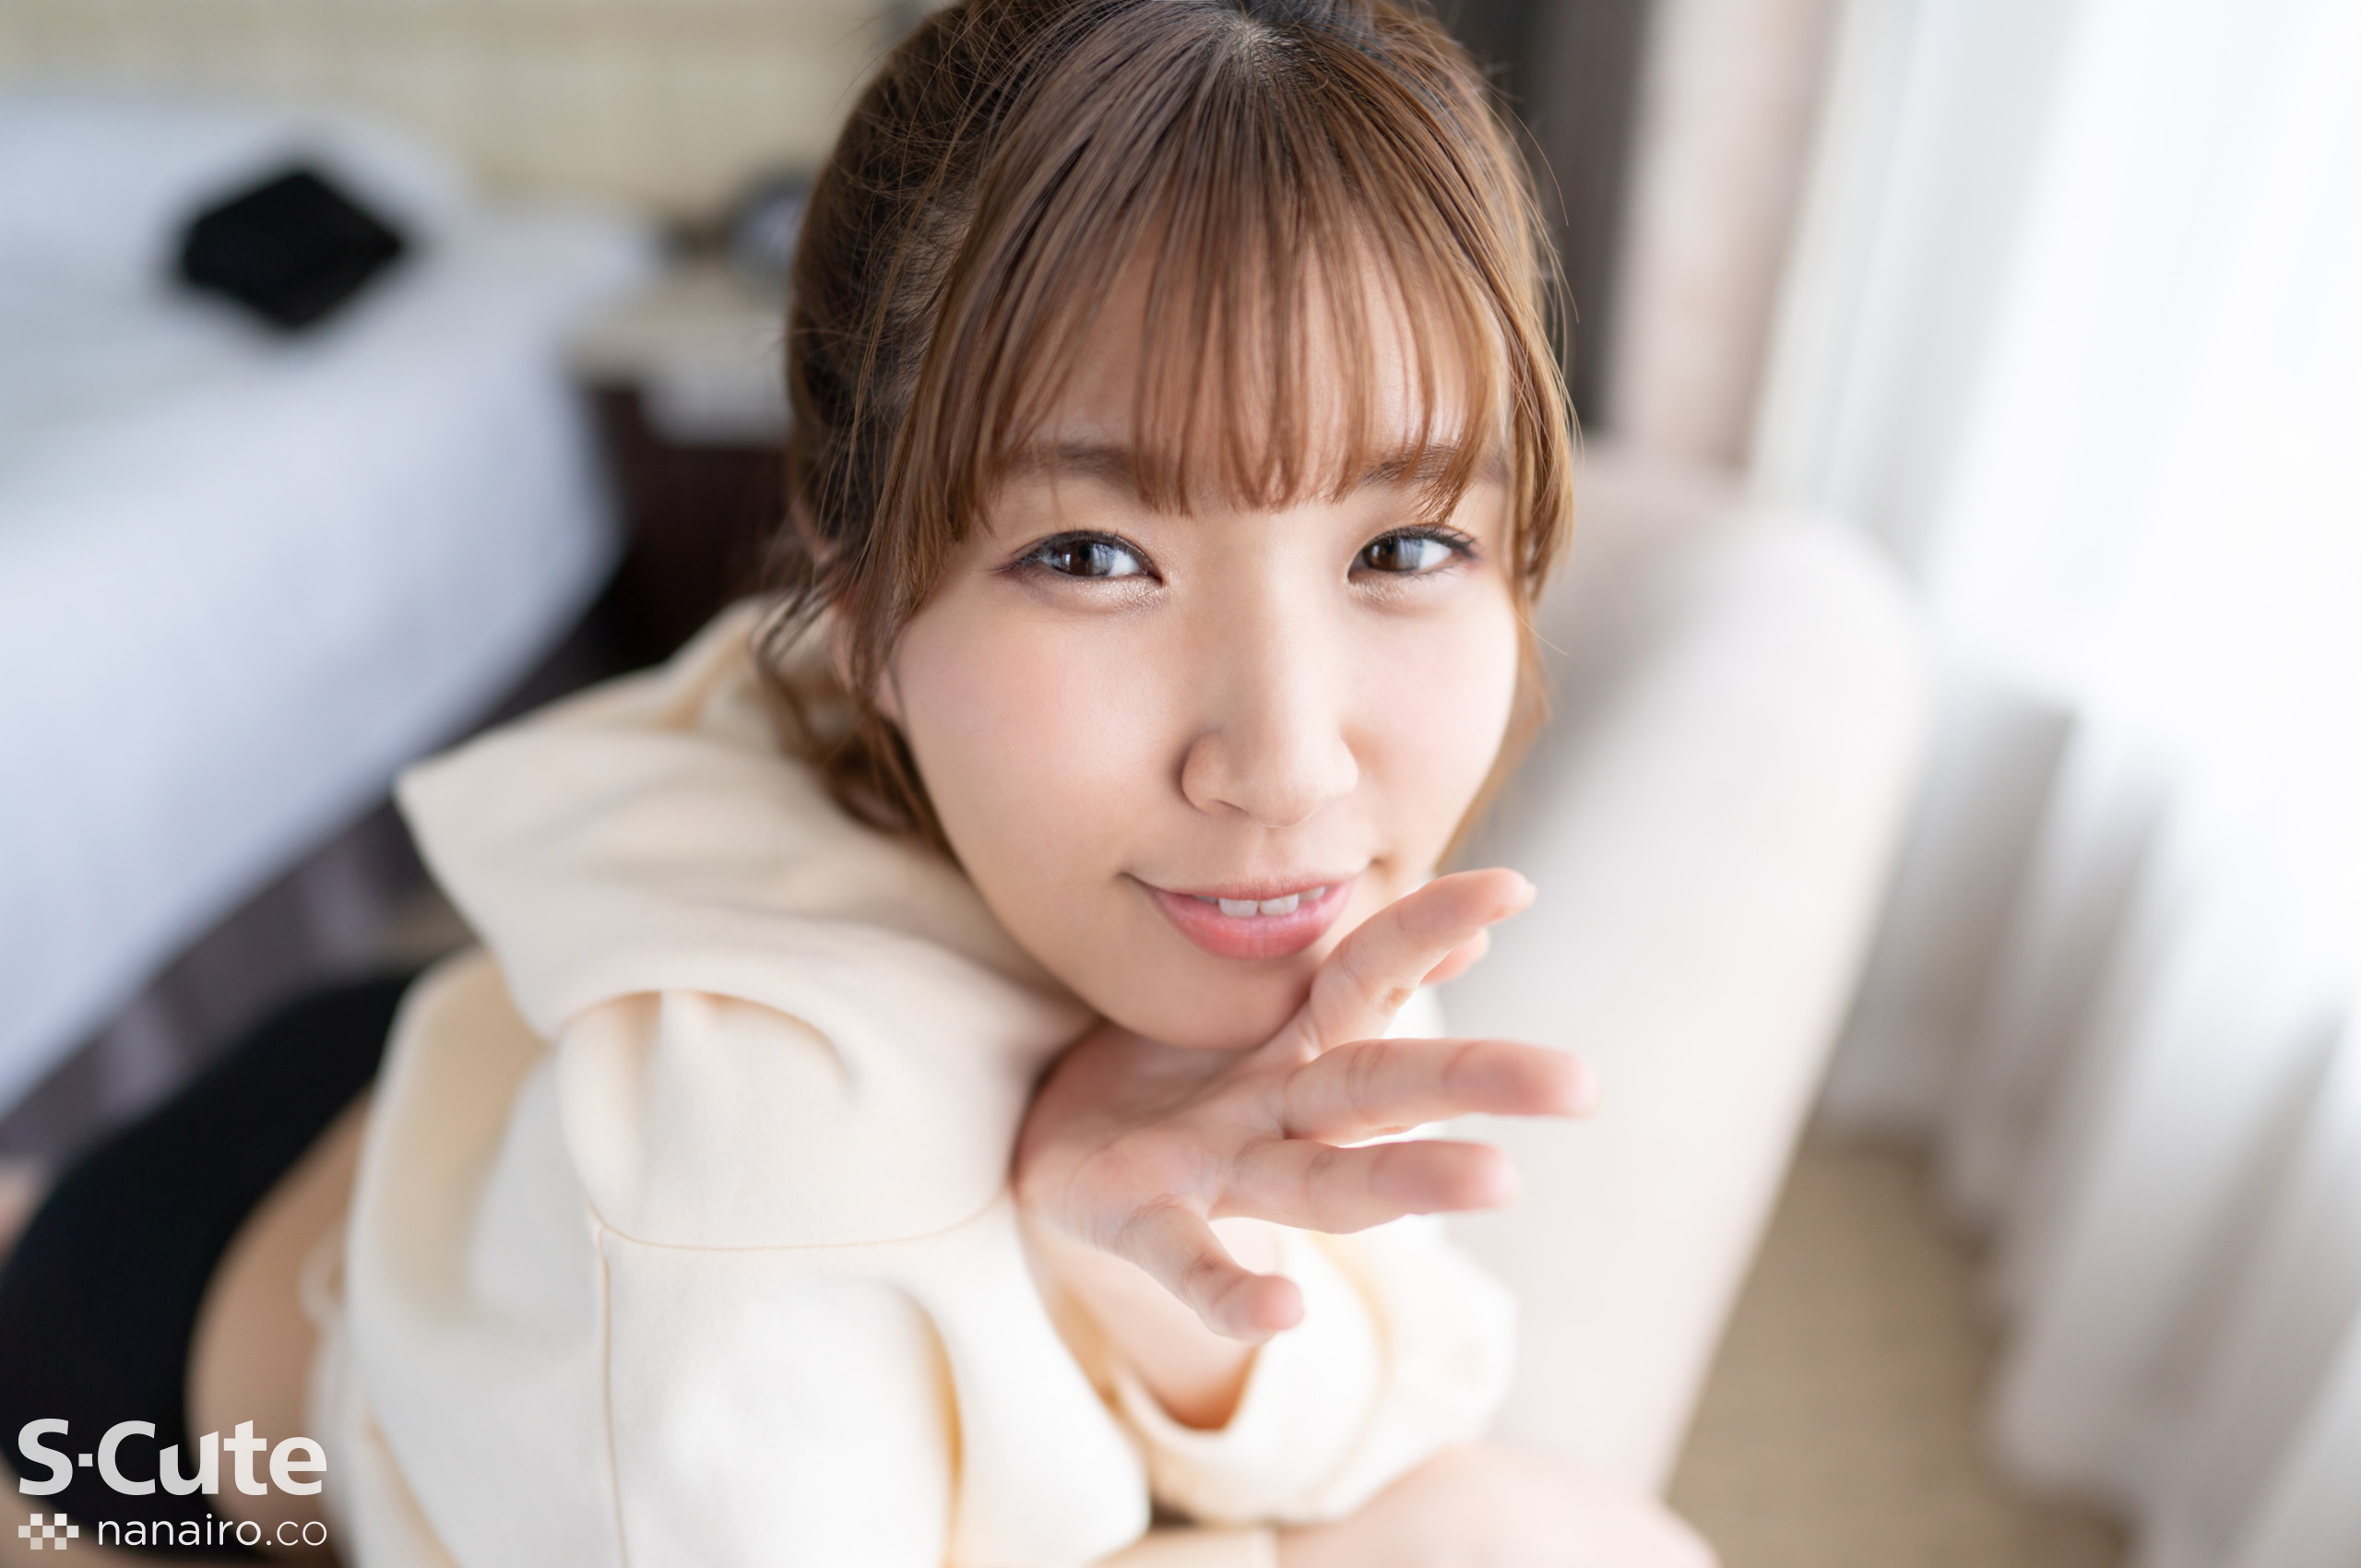 S-Cute 870_mitsuha_01 目いっぱいキスをしてから始まる熱烈セックス/Mitsuha